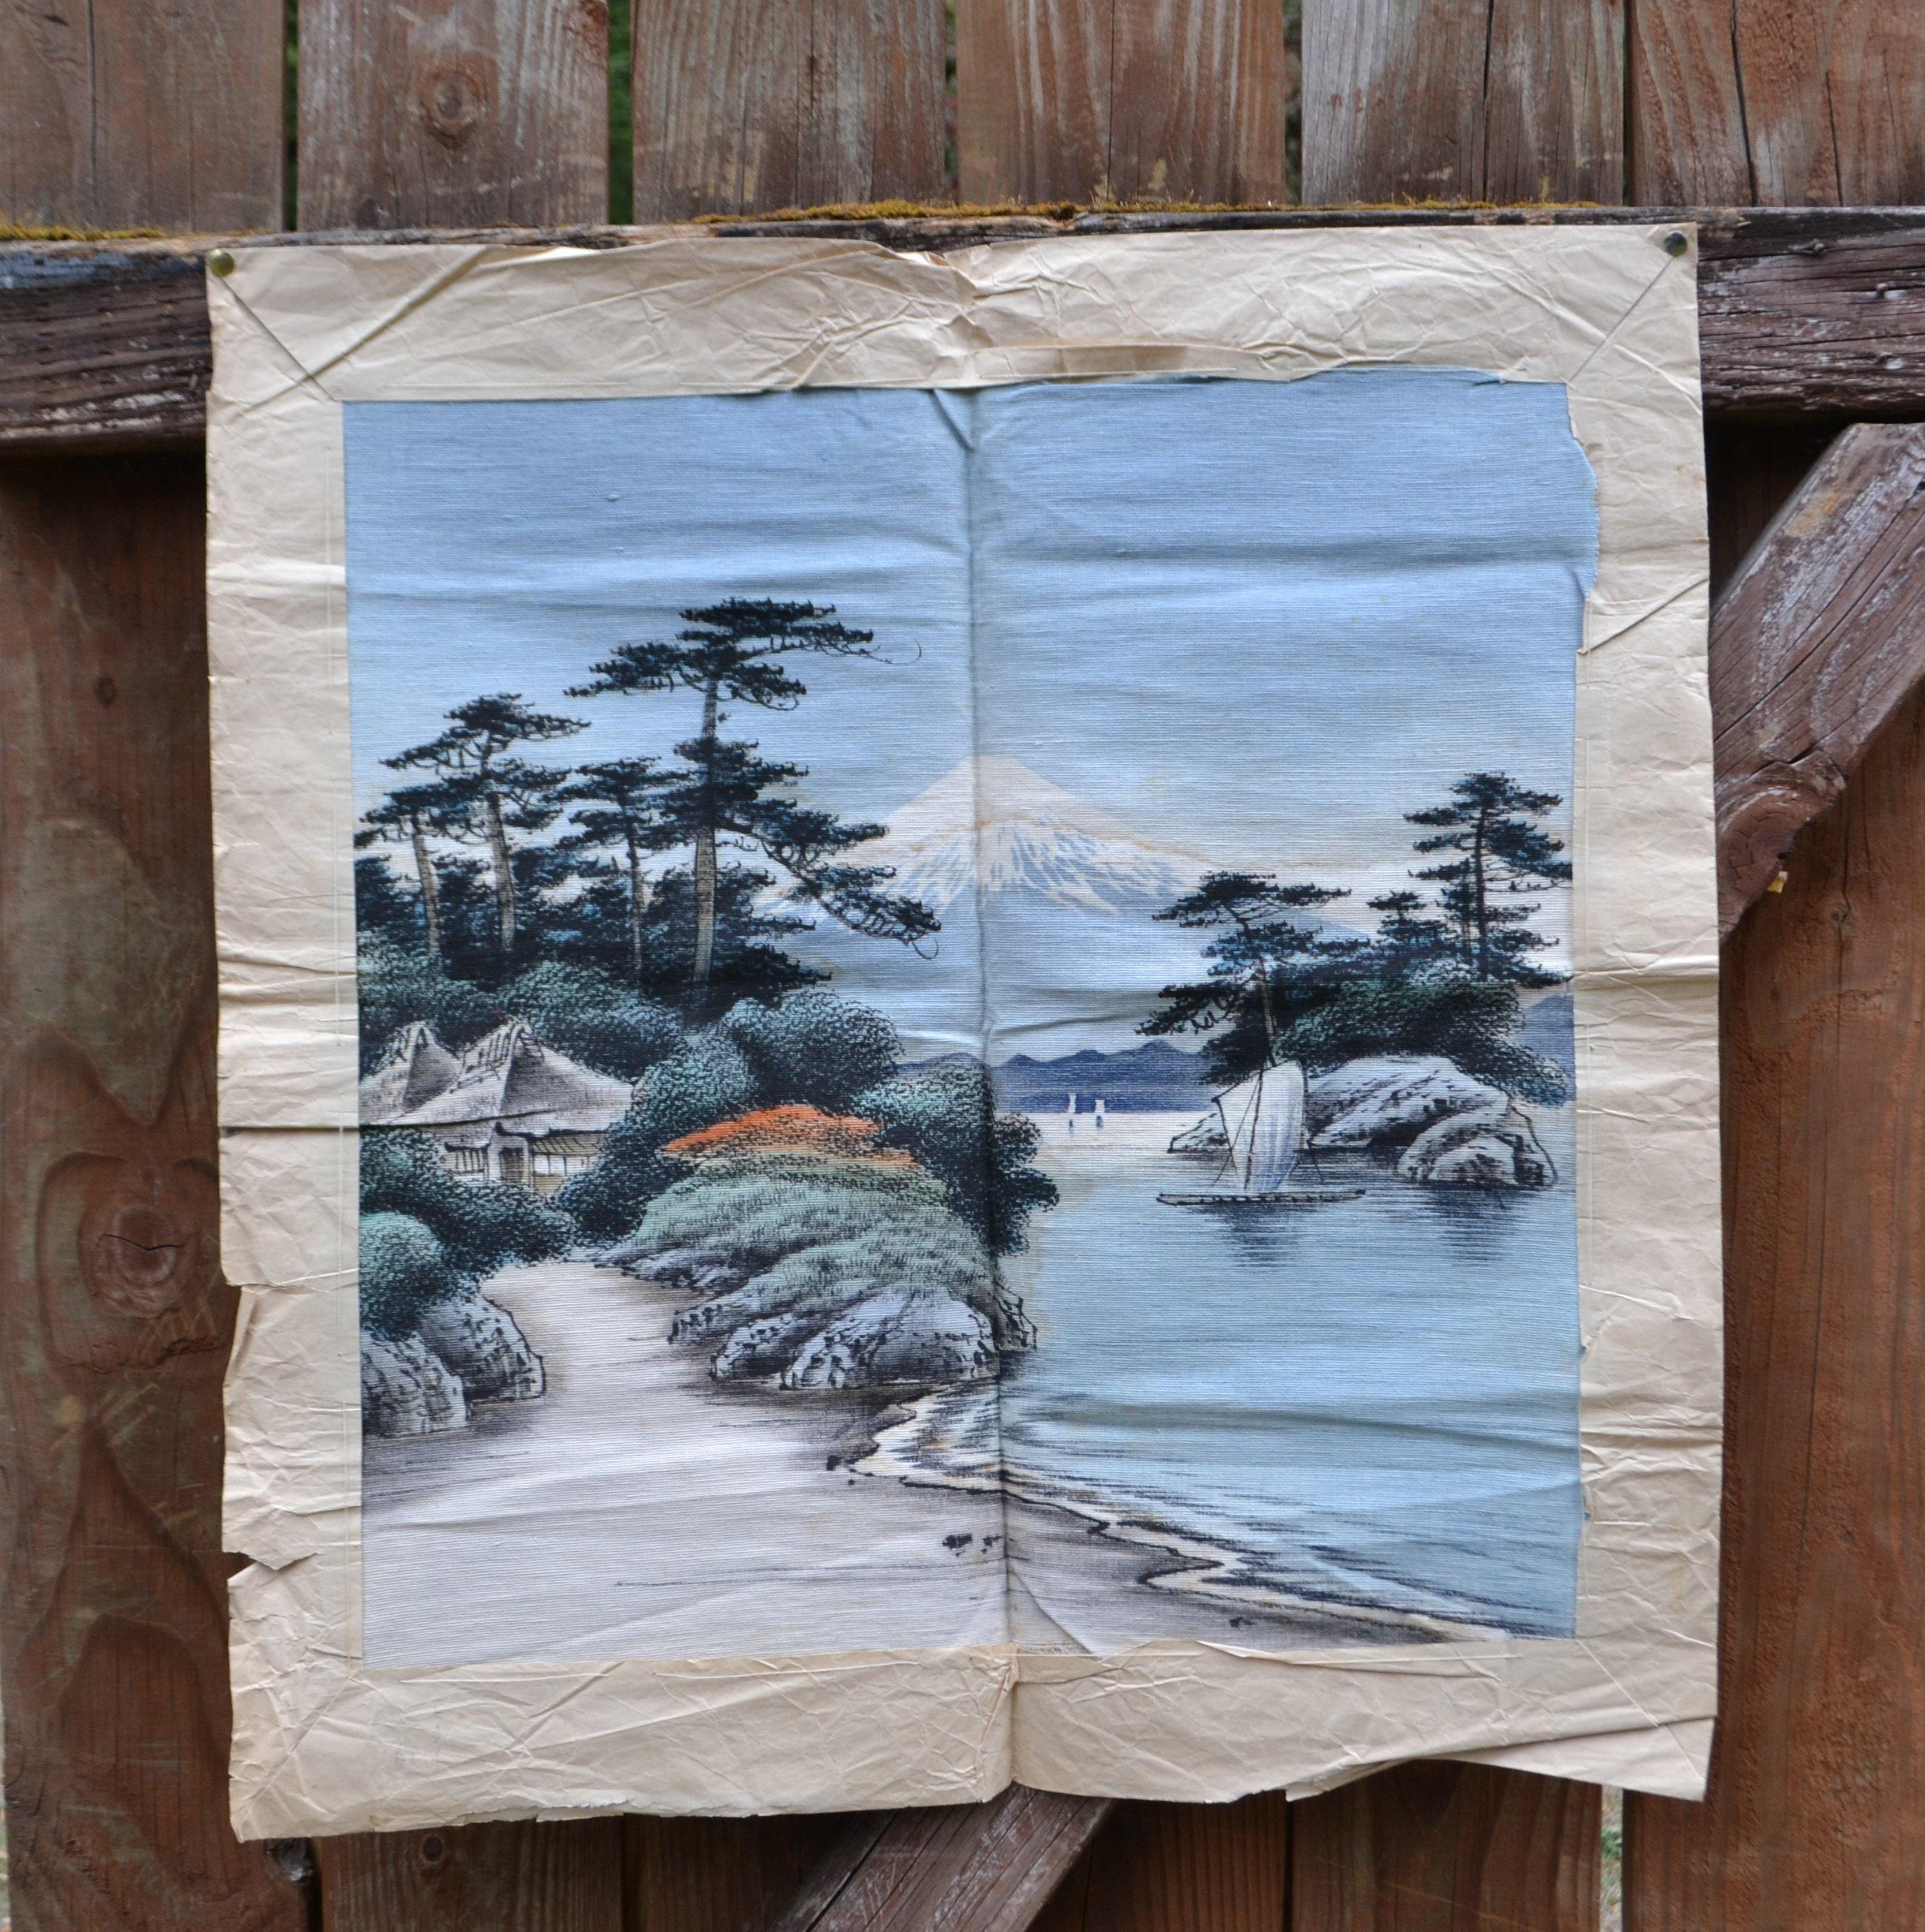 de263945e437 Vintage mount fuji japanese textile art tapestry wall etsy jpg 2820x2830 Mount  fuji antique japanese tapestry